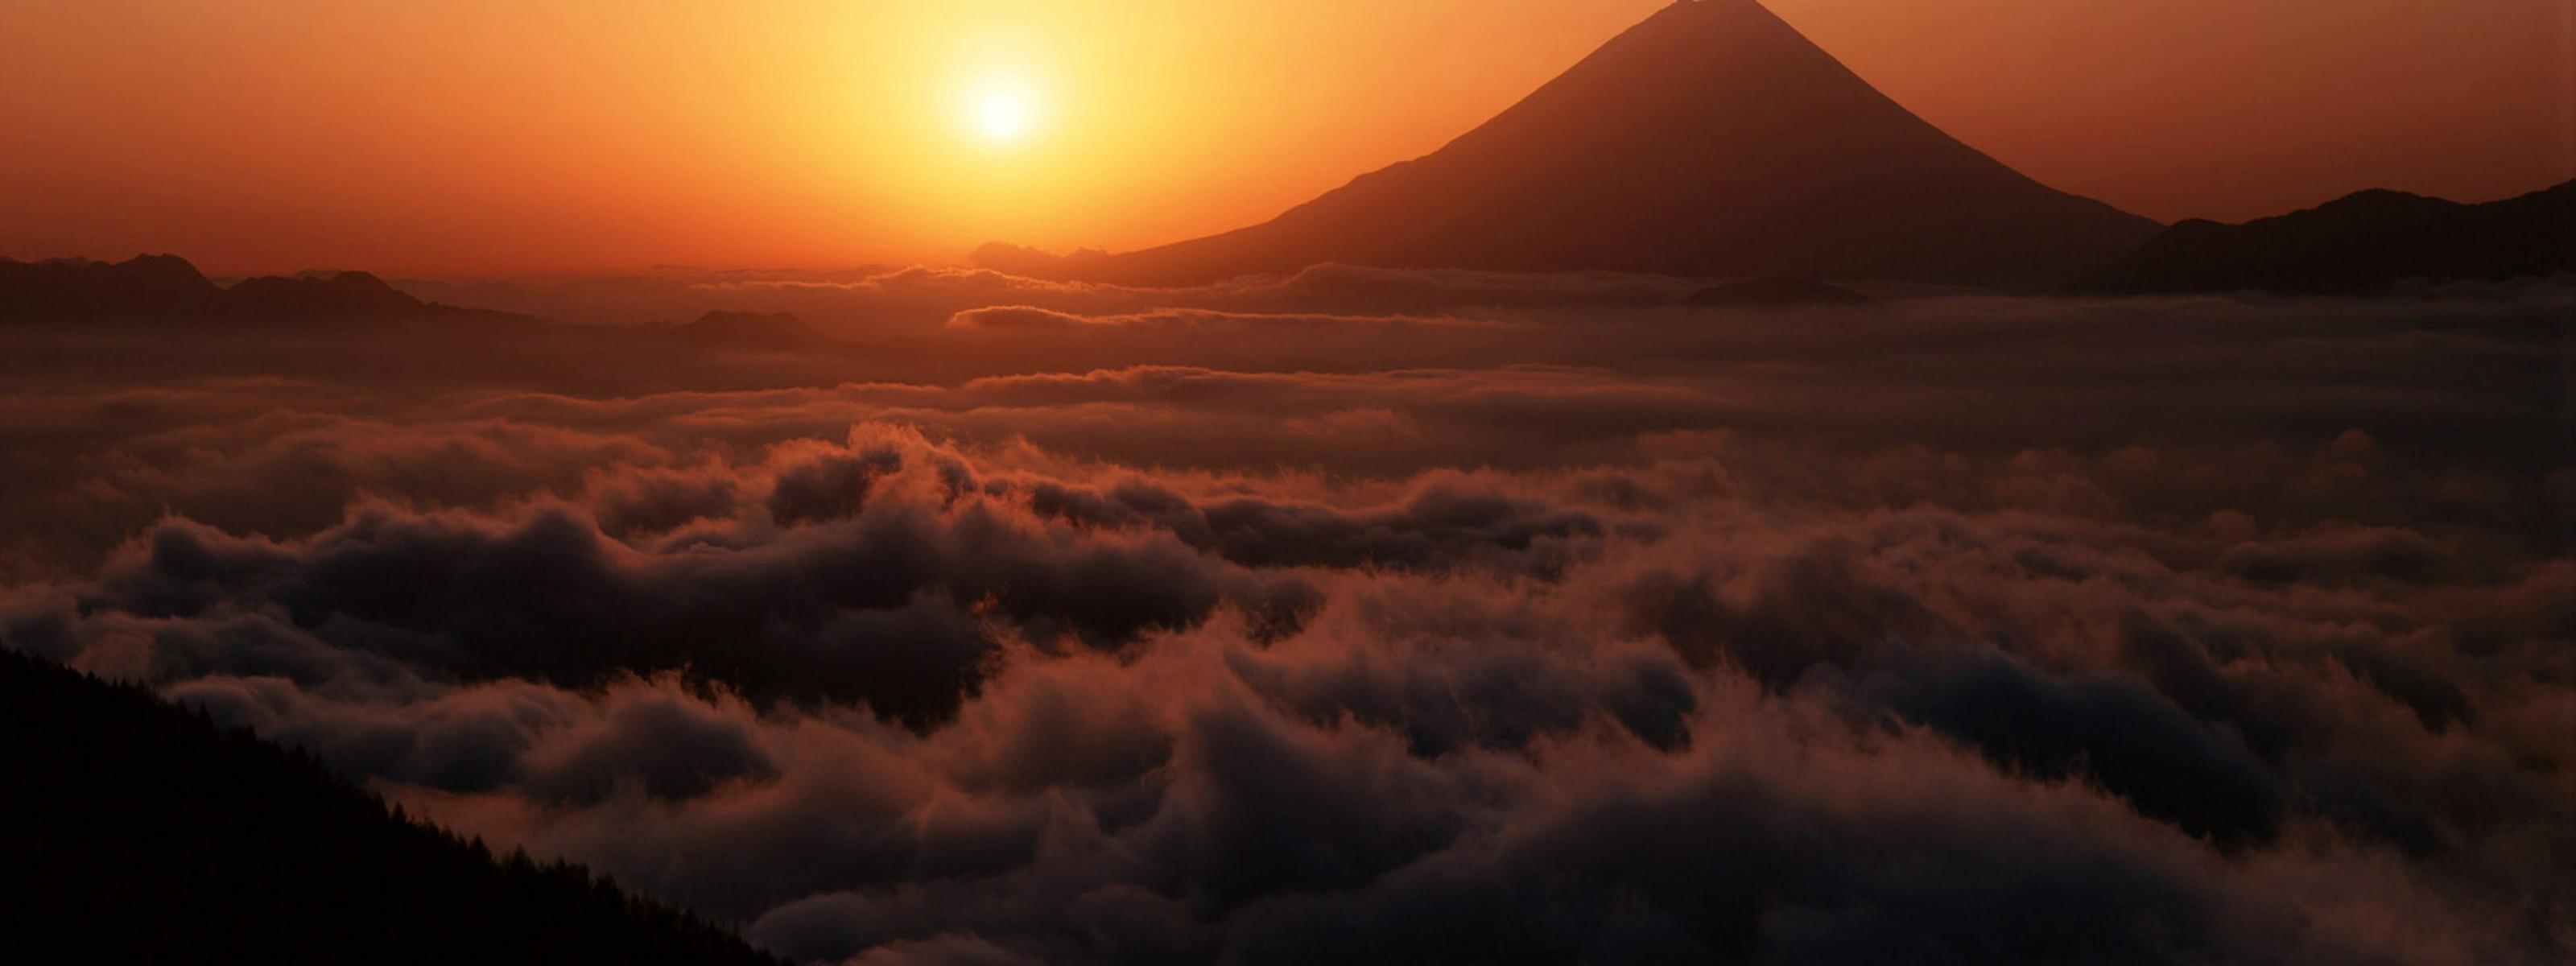 Red Cloudy Sunset [3200x1200] iimgurcom 3200x1200